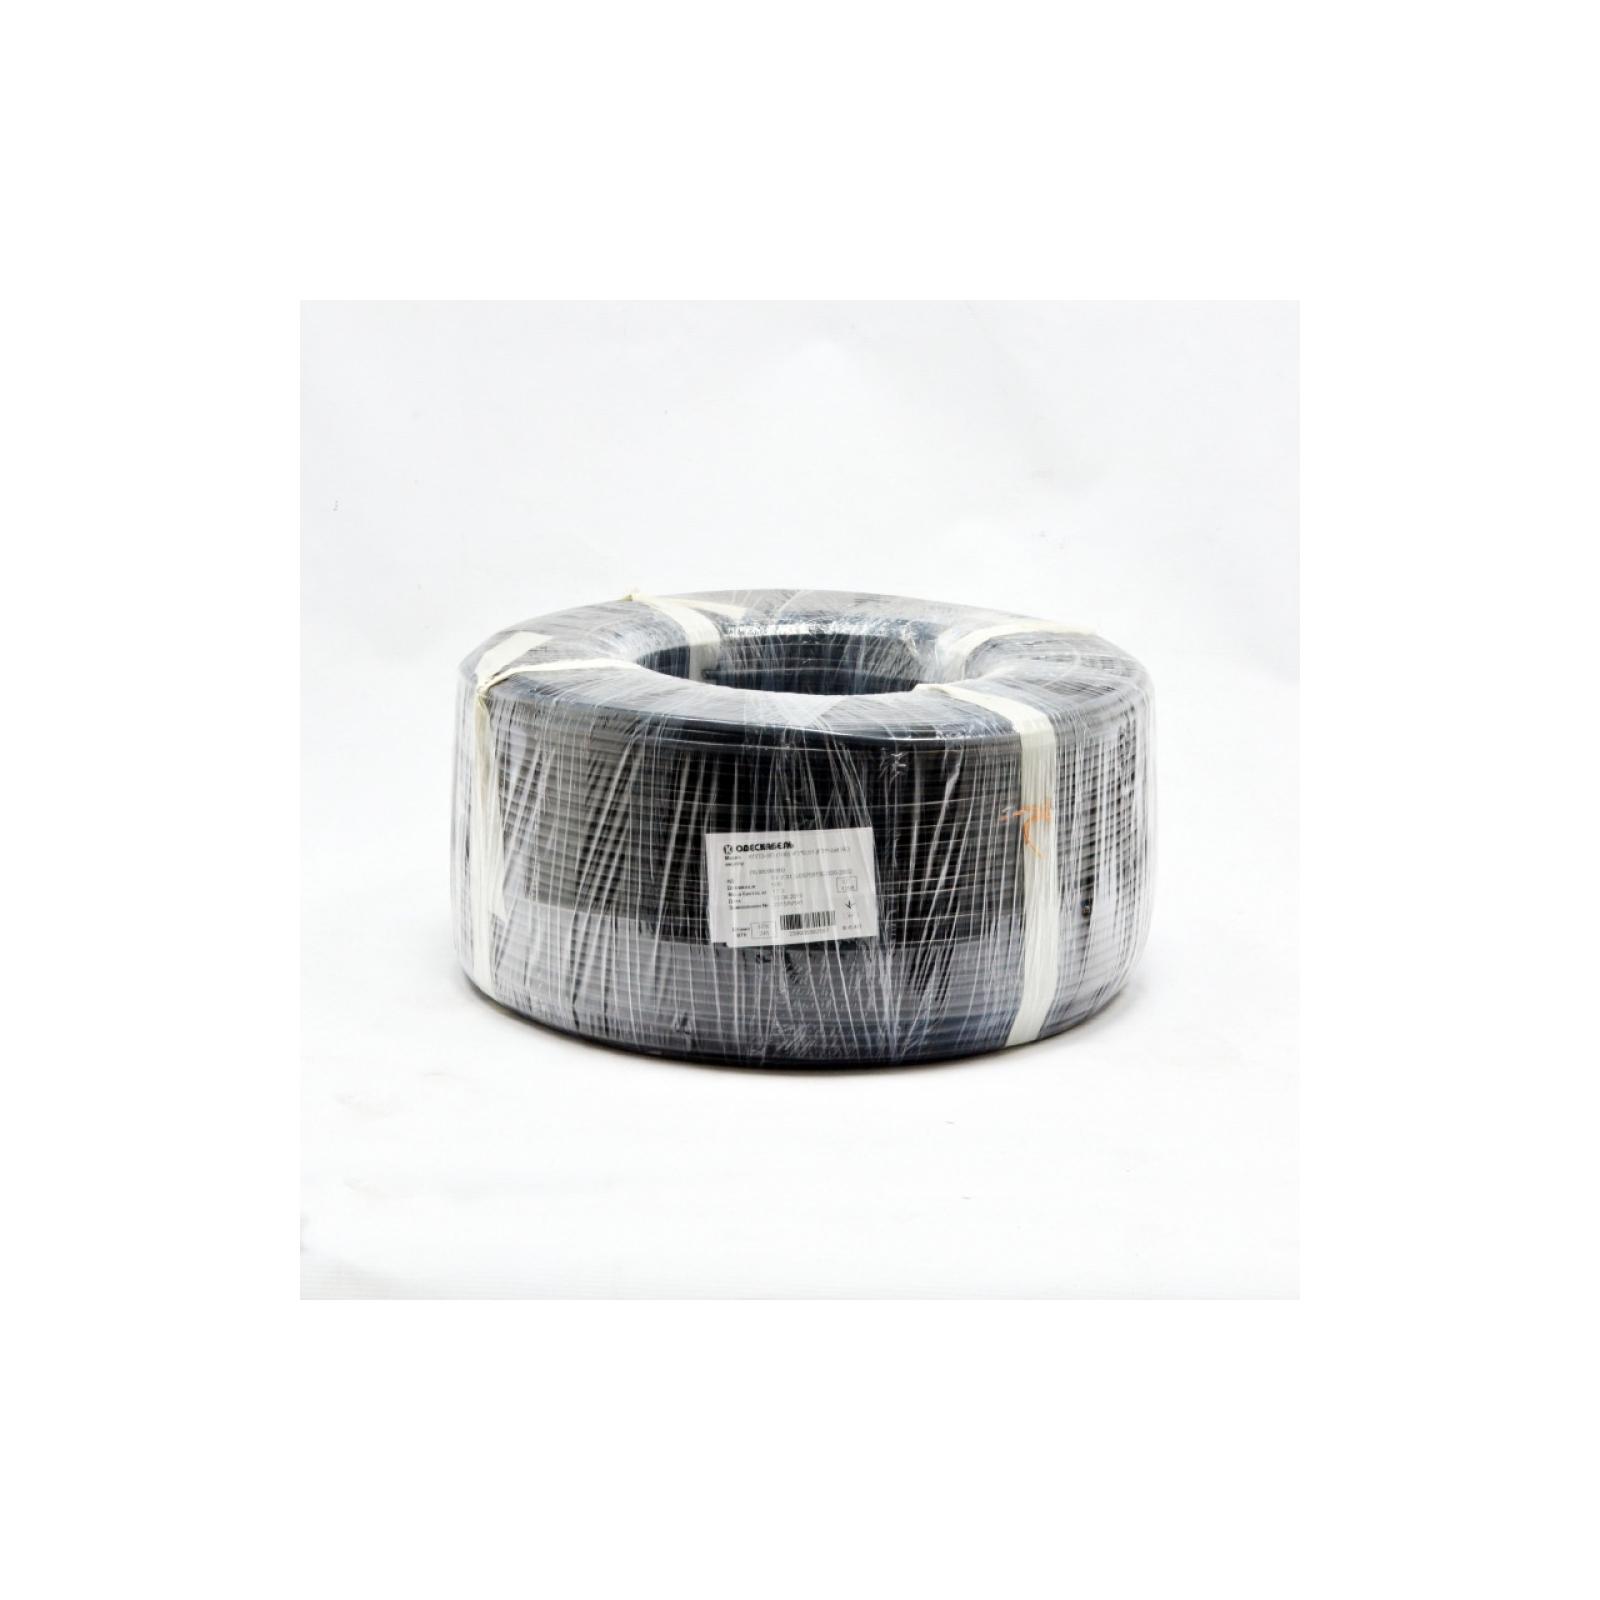 Кабель сетевой OK-Net FTP 500м (КППЭт-ВП (100) 4х2х0,51)